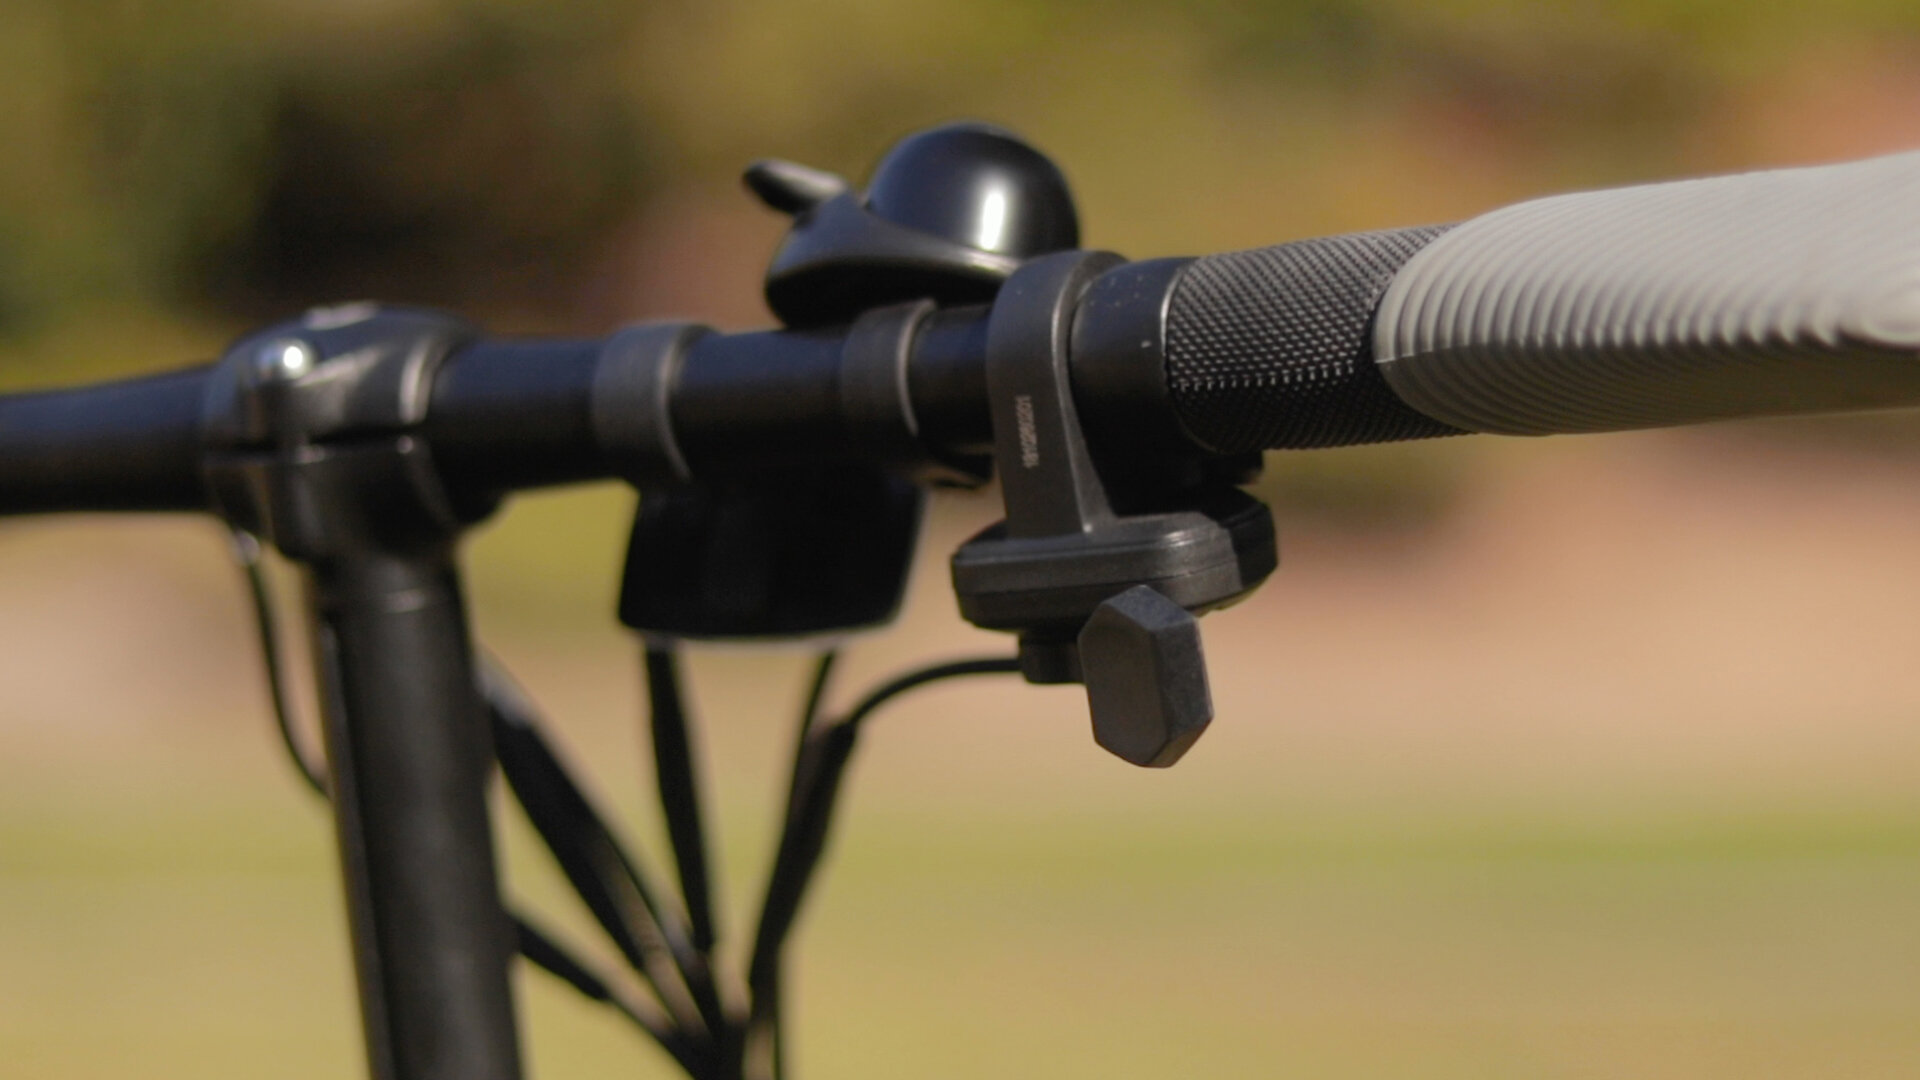 gotrax-shift-s1-electric-bike-review-2019-throttle.jpg